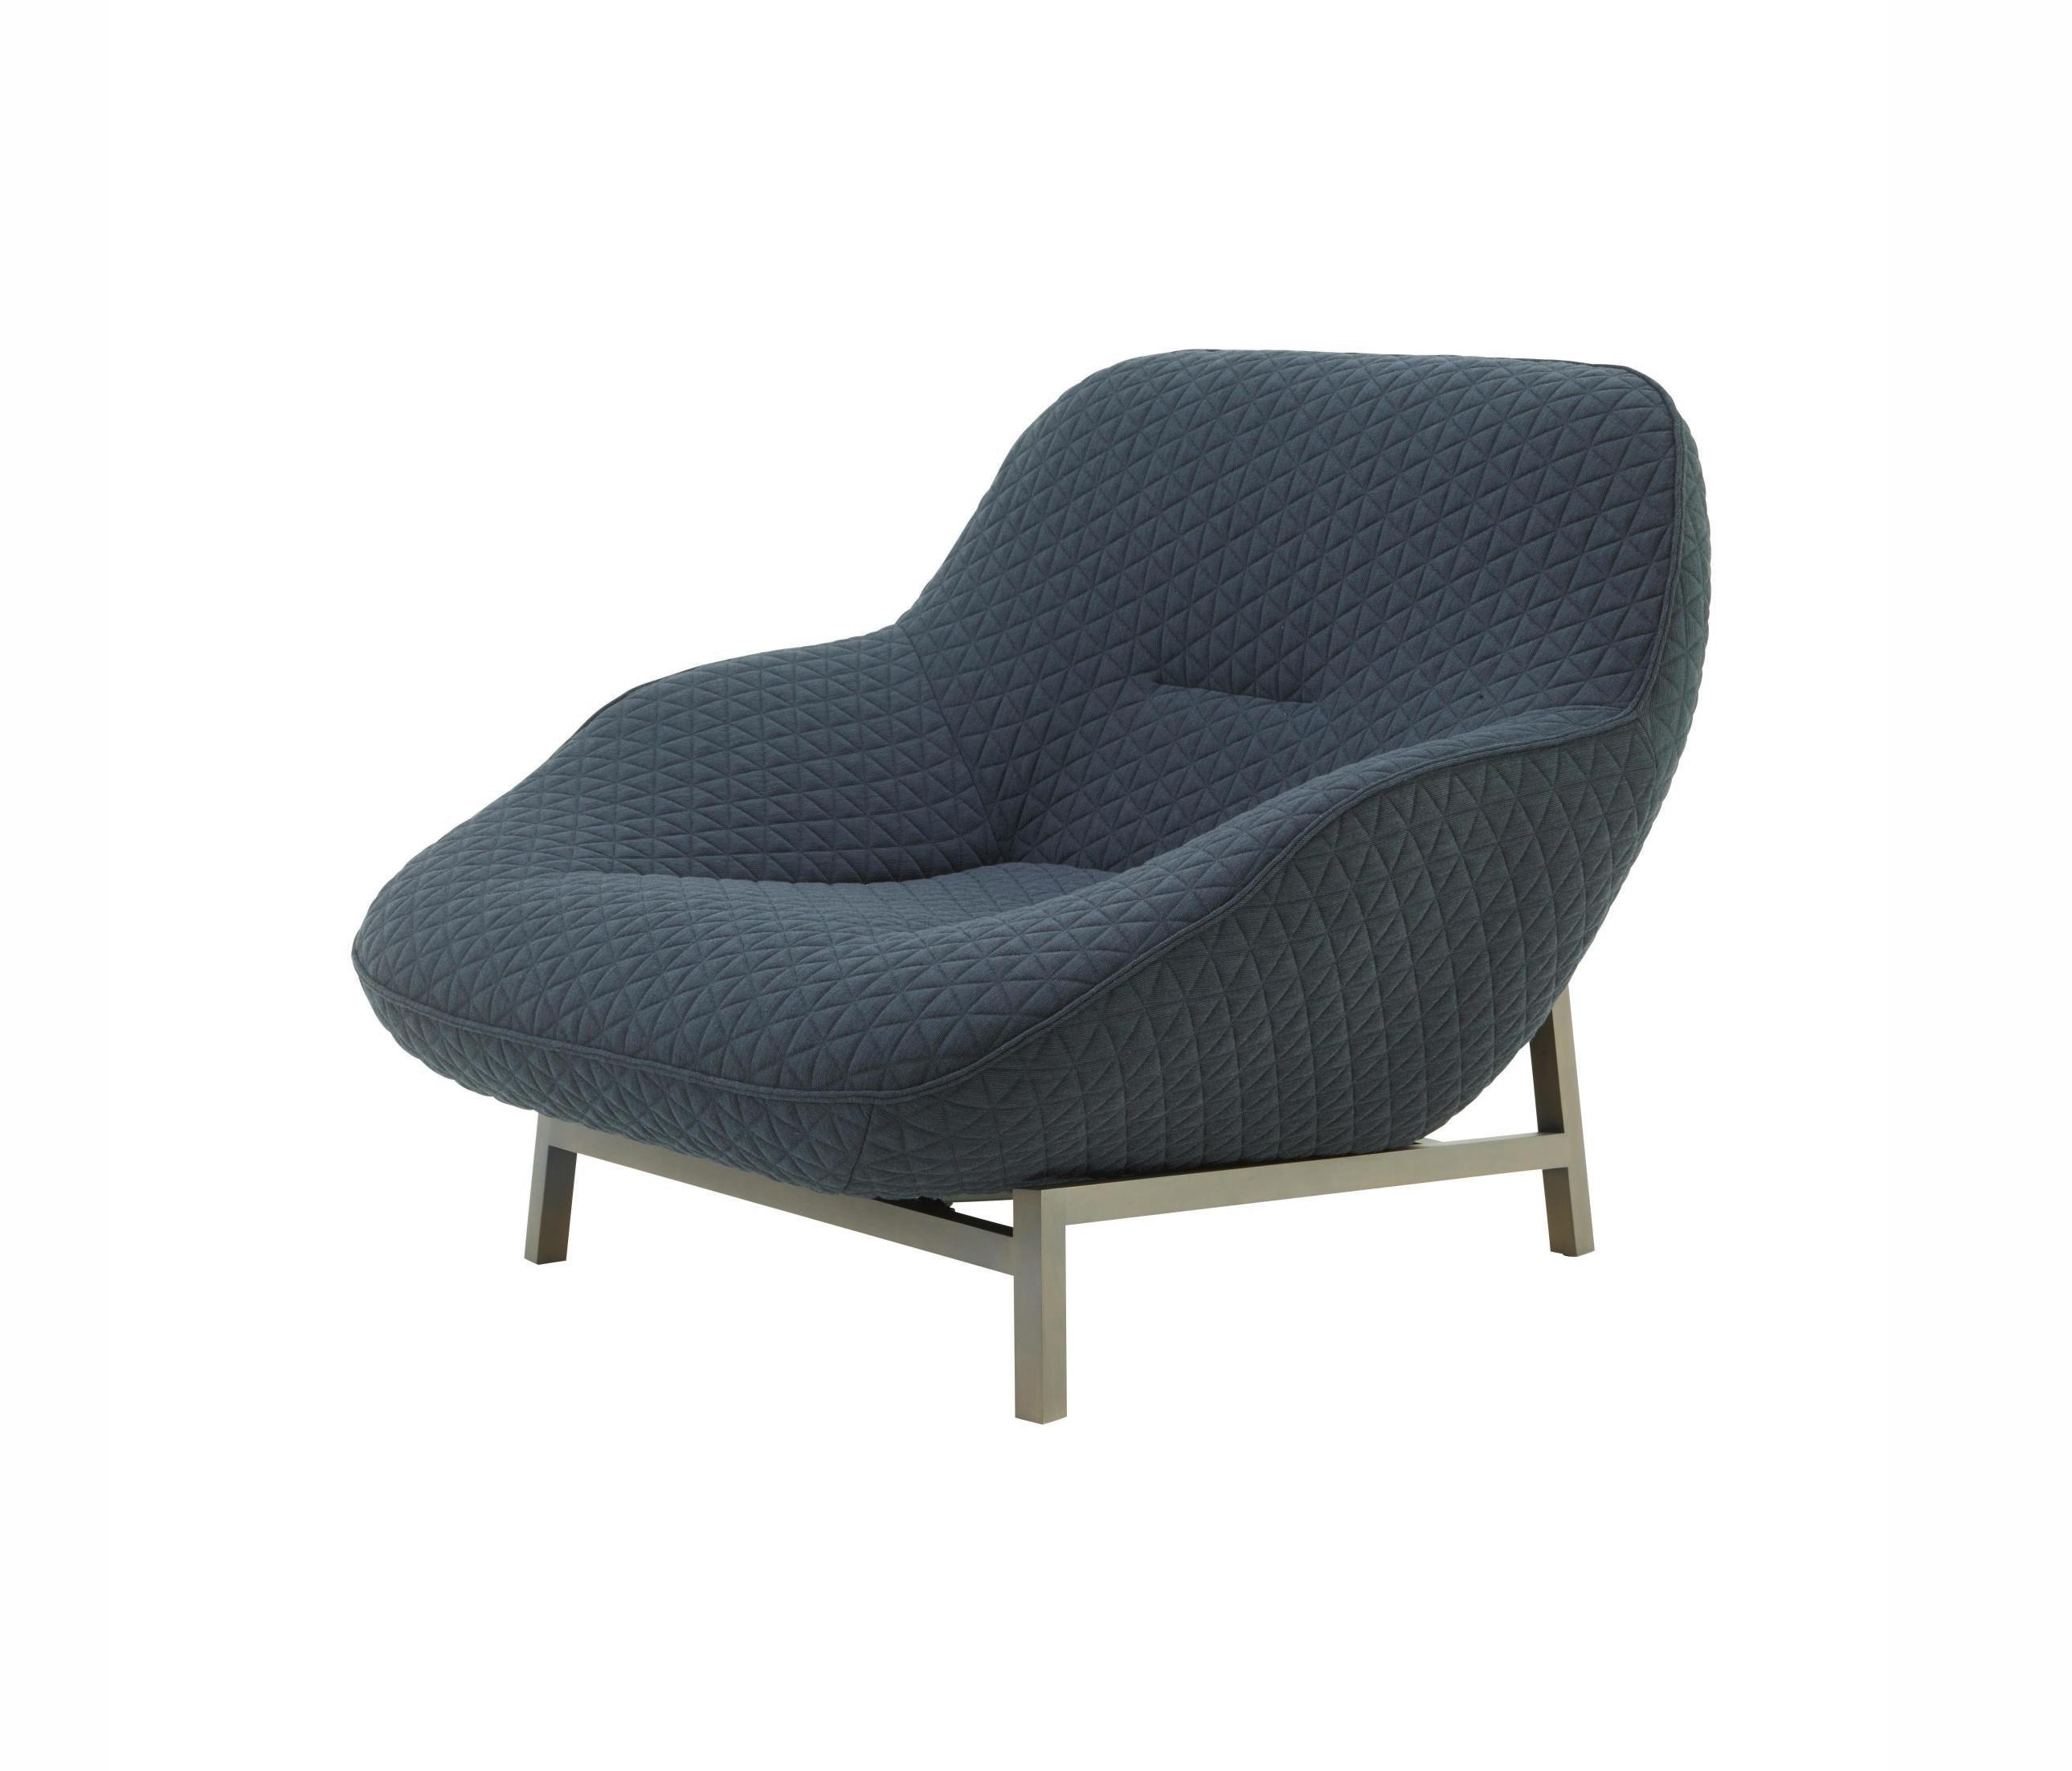 cosse sessel mit armlehnen sessel von ligne roset architonic. Black Bedroom Furniture Sets. Home Design Ideas